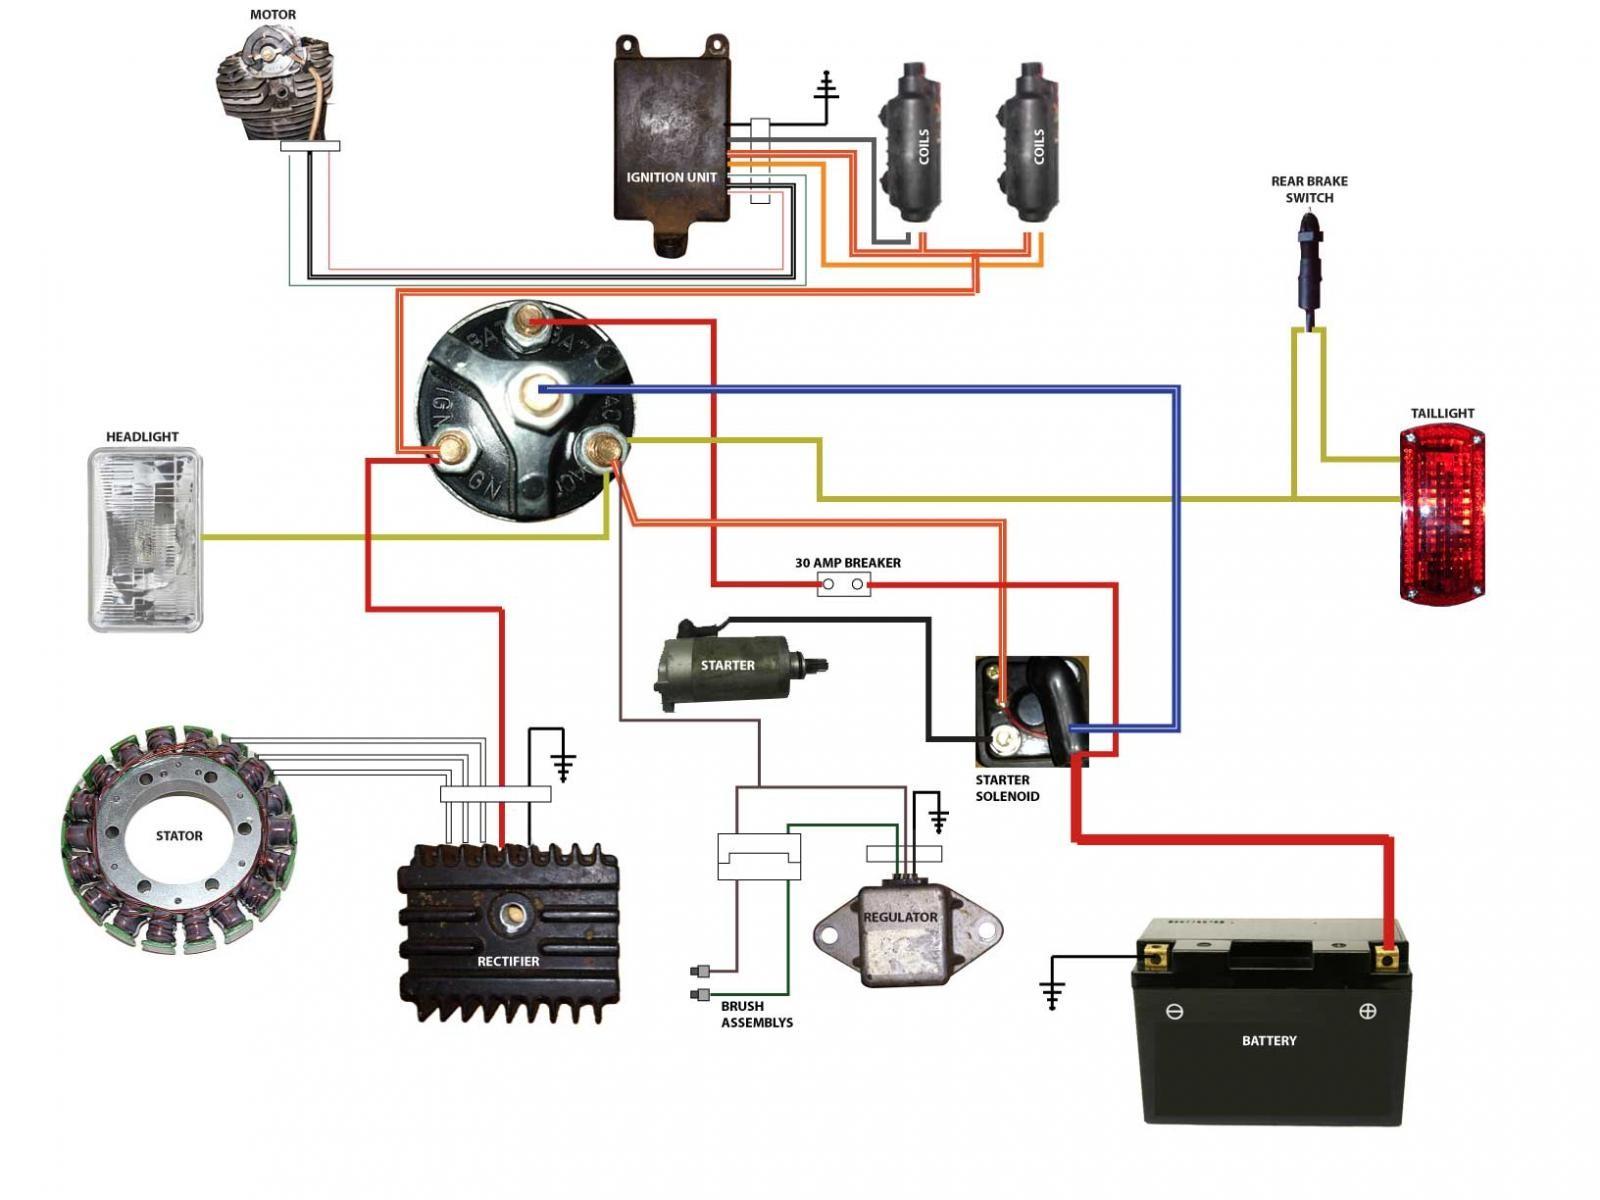 Basic Headlight Wiring Diagram Motorcycle